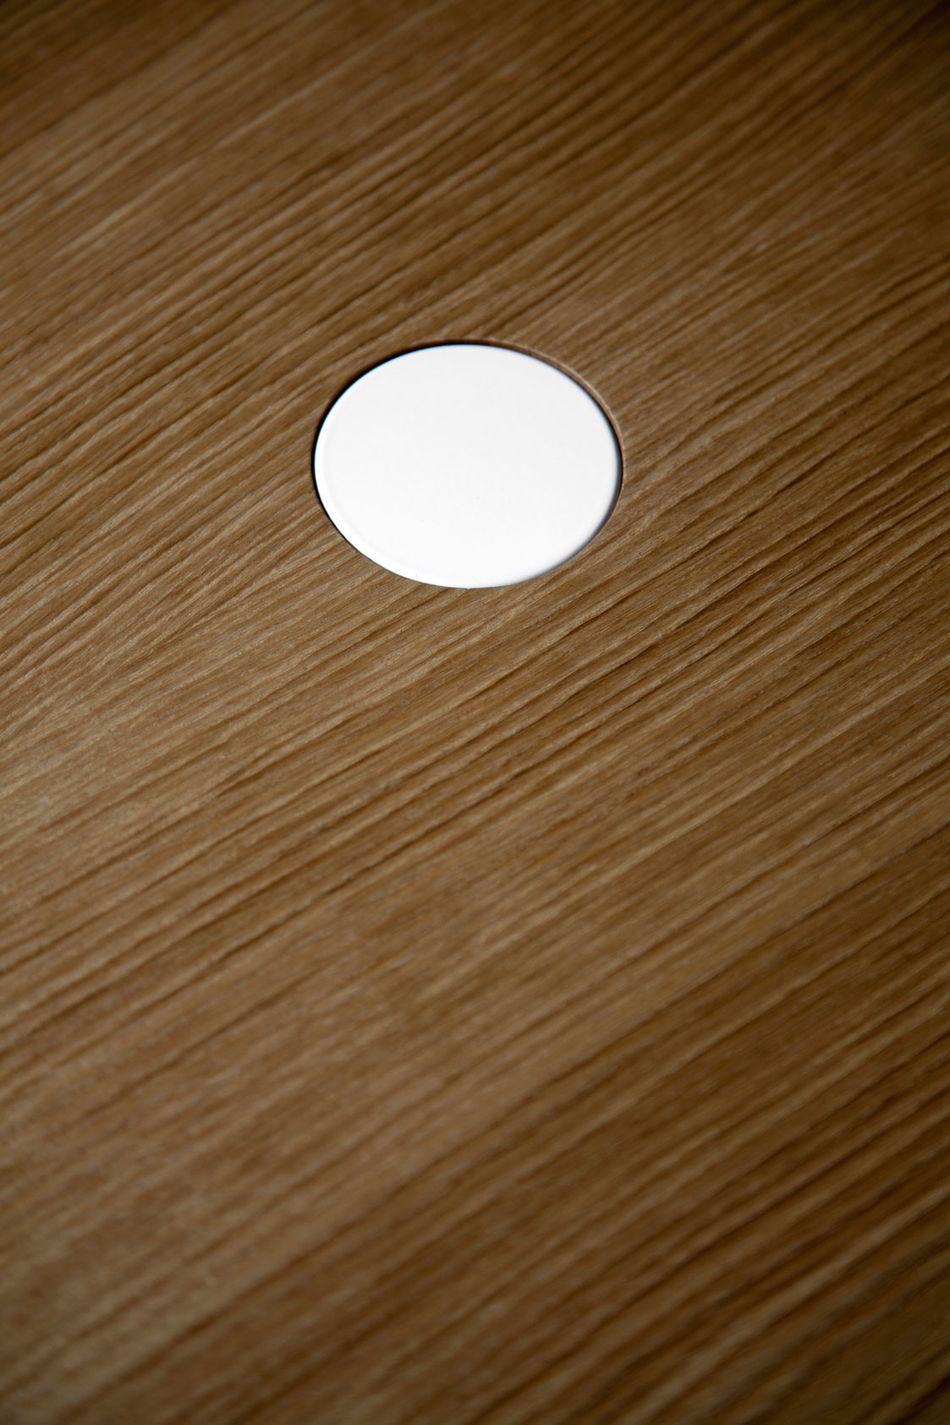 mesa-punt-puntmobles-nucleo-madera-pata-cilindrica-detalle